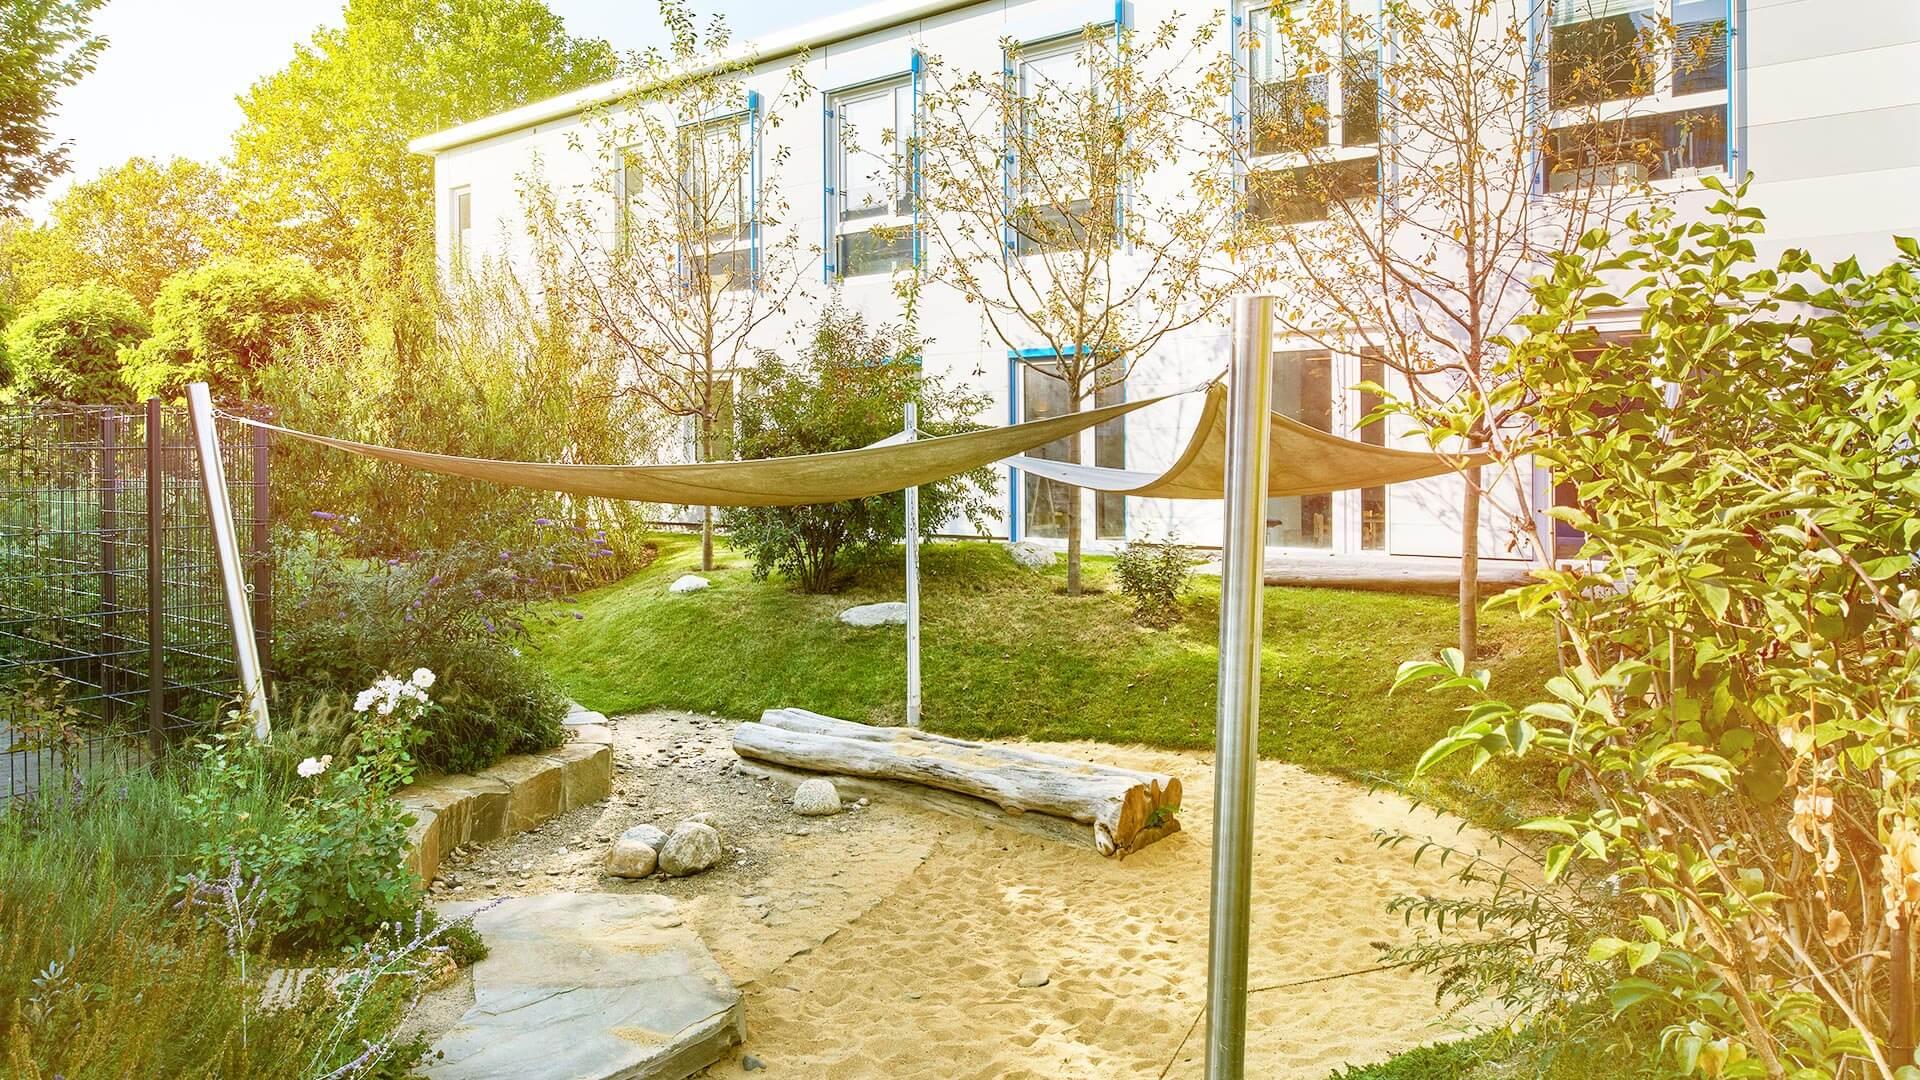 optimaler Betriebskindergarten Fassade aussengebaude